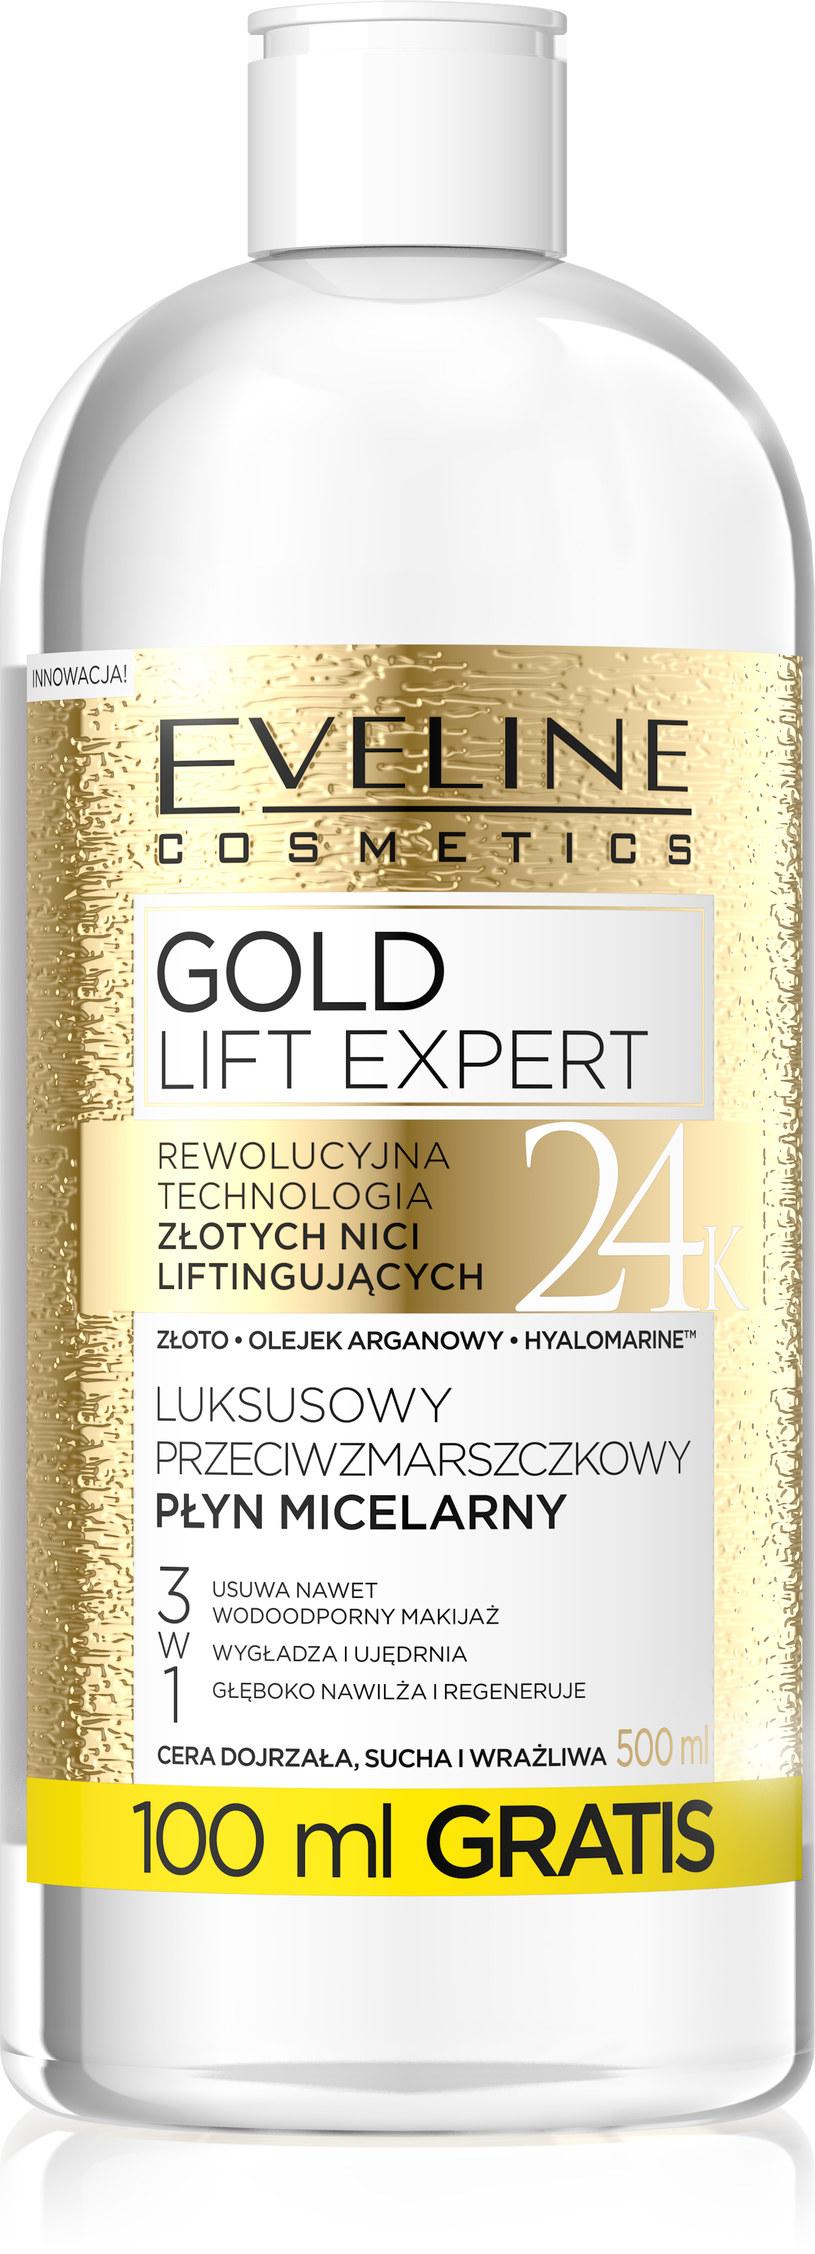 Gold Lift Expert Eveline Cosmetics /INTERIA.PL/materiały prasowe